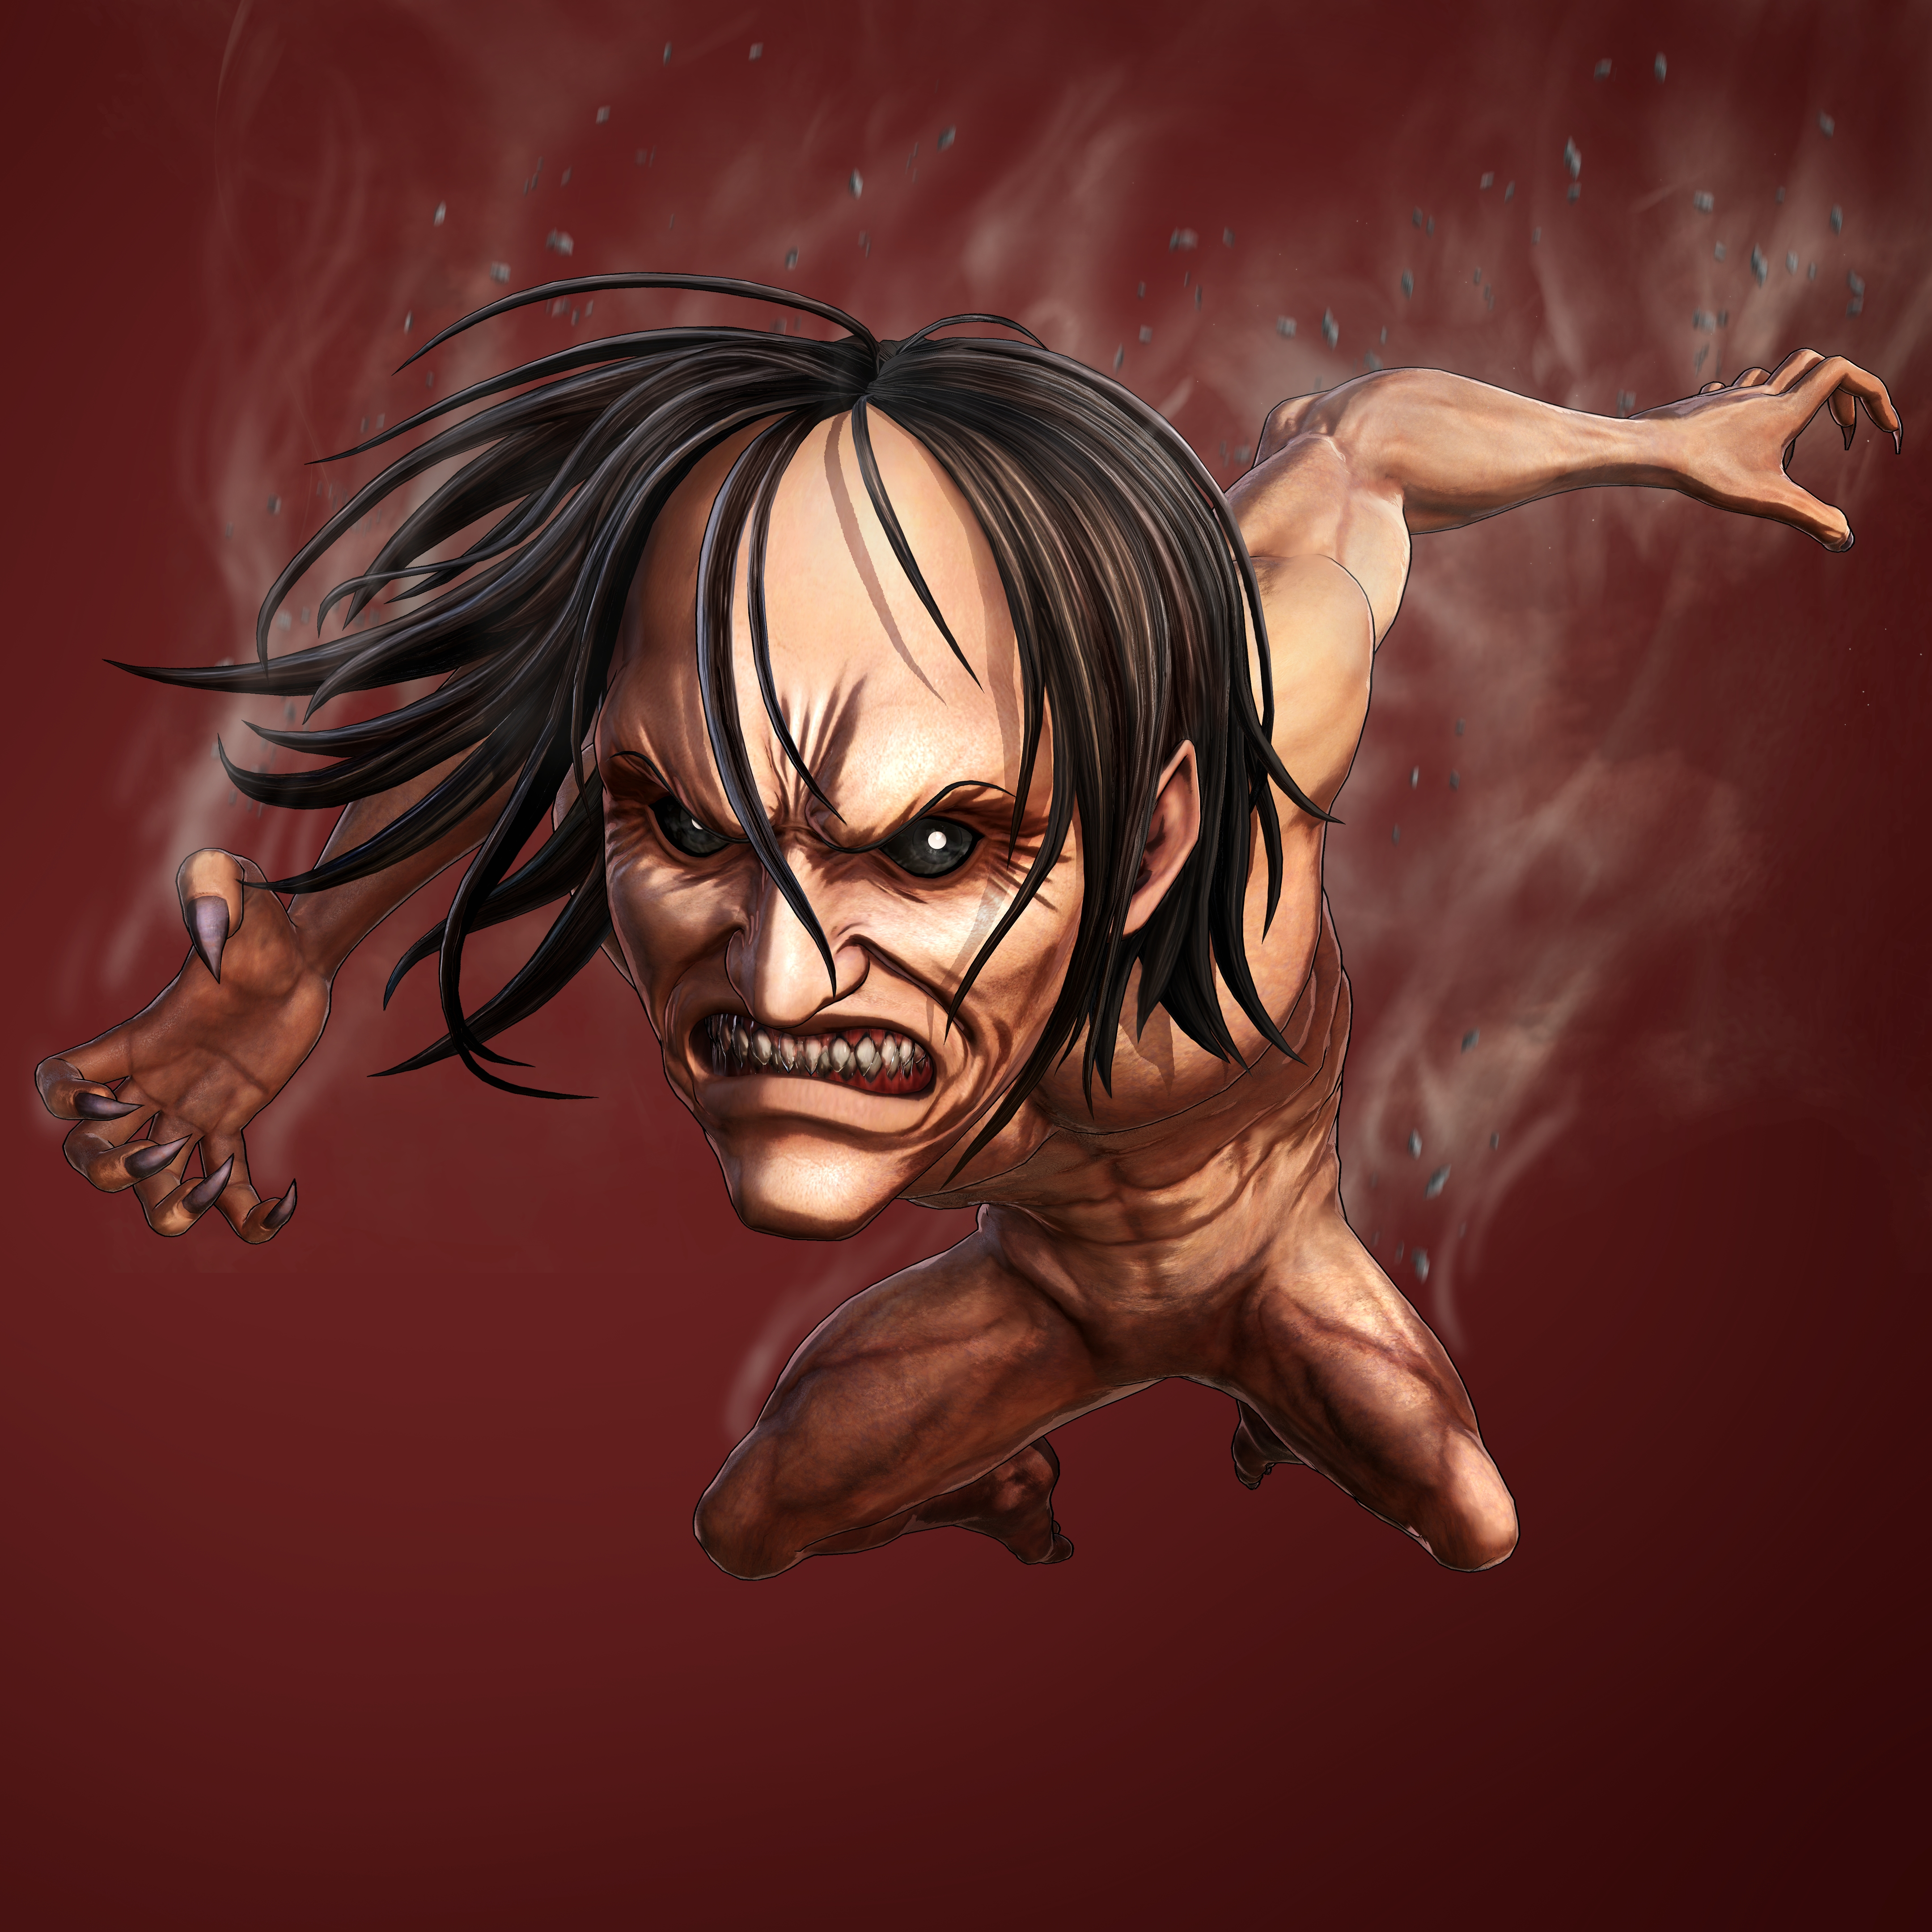 Attack on Titan 2 Mystery Titan render